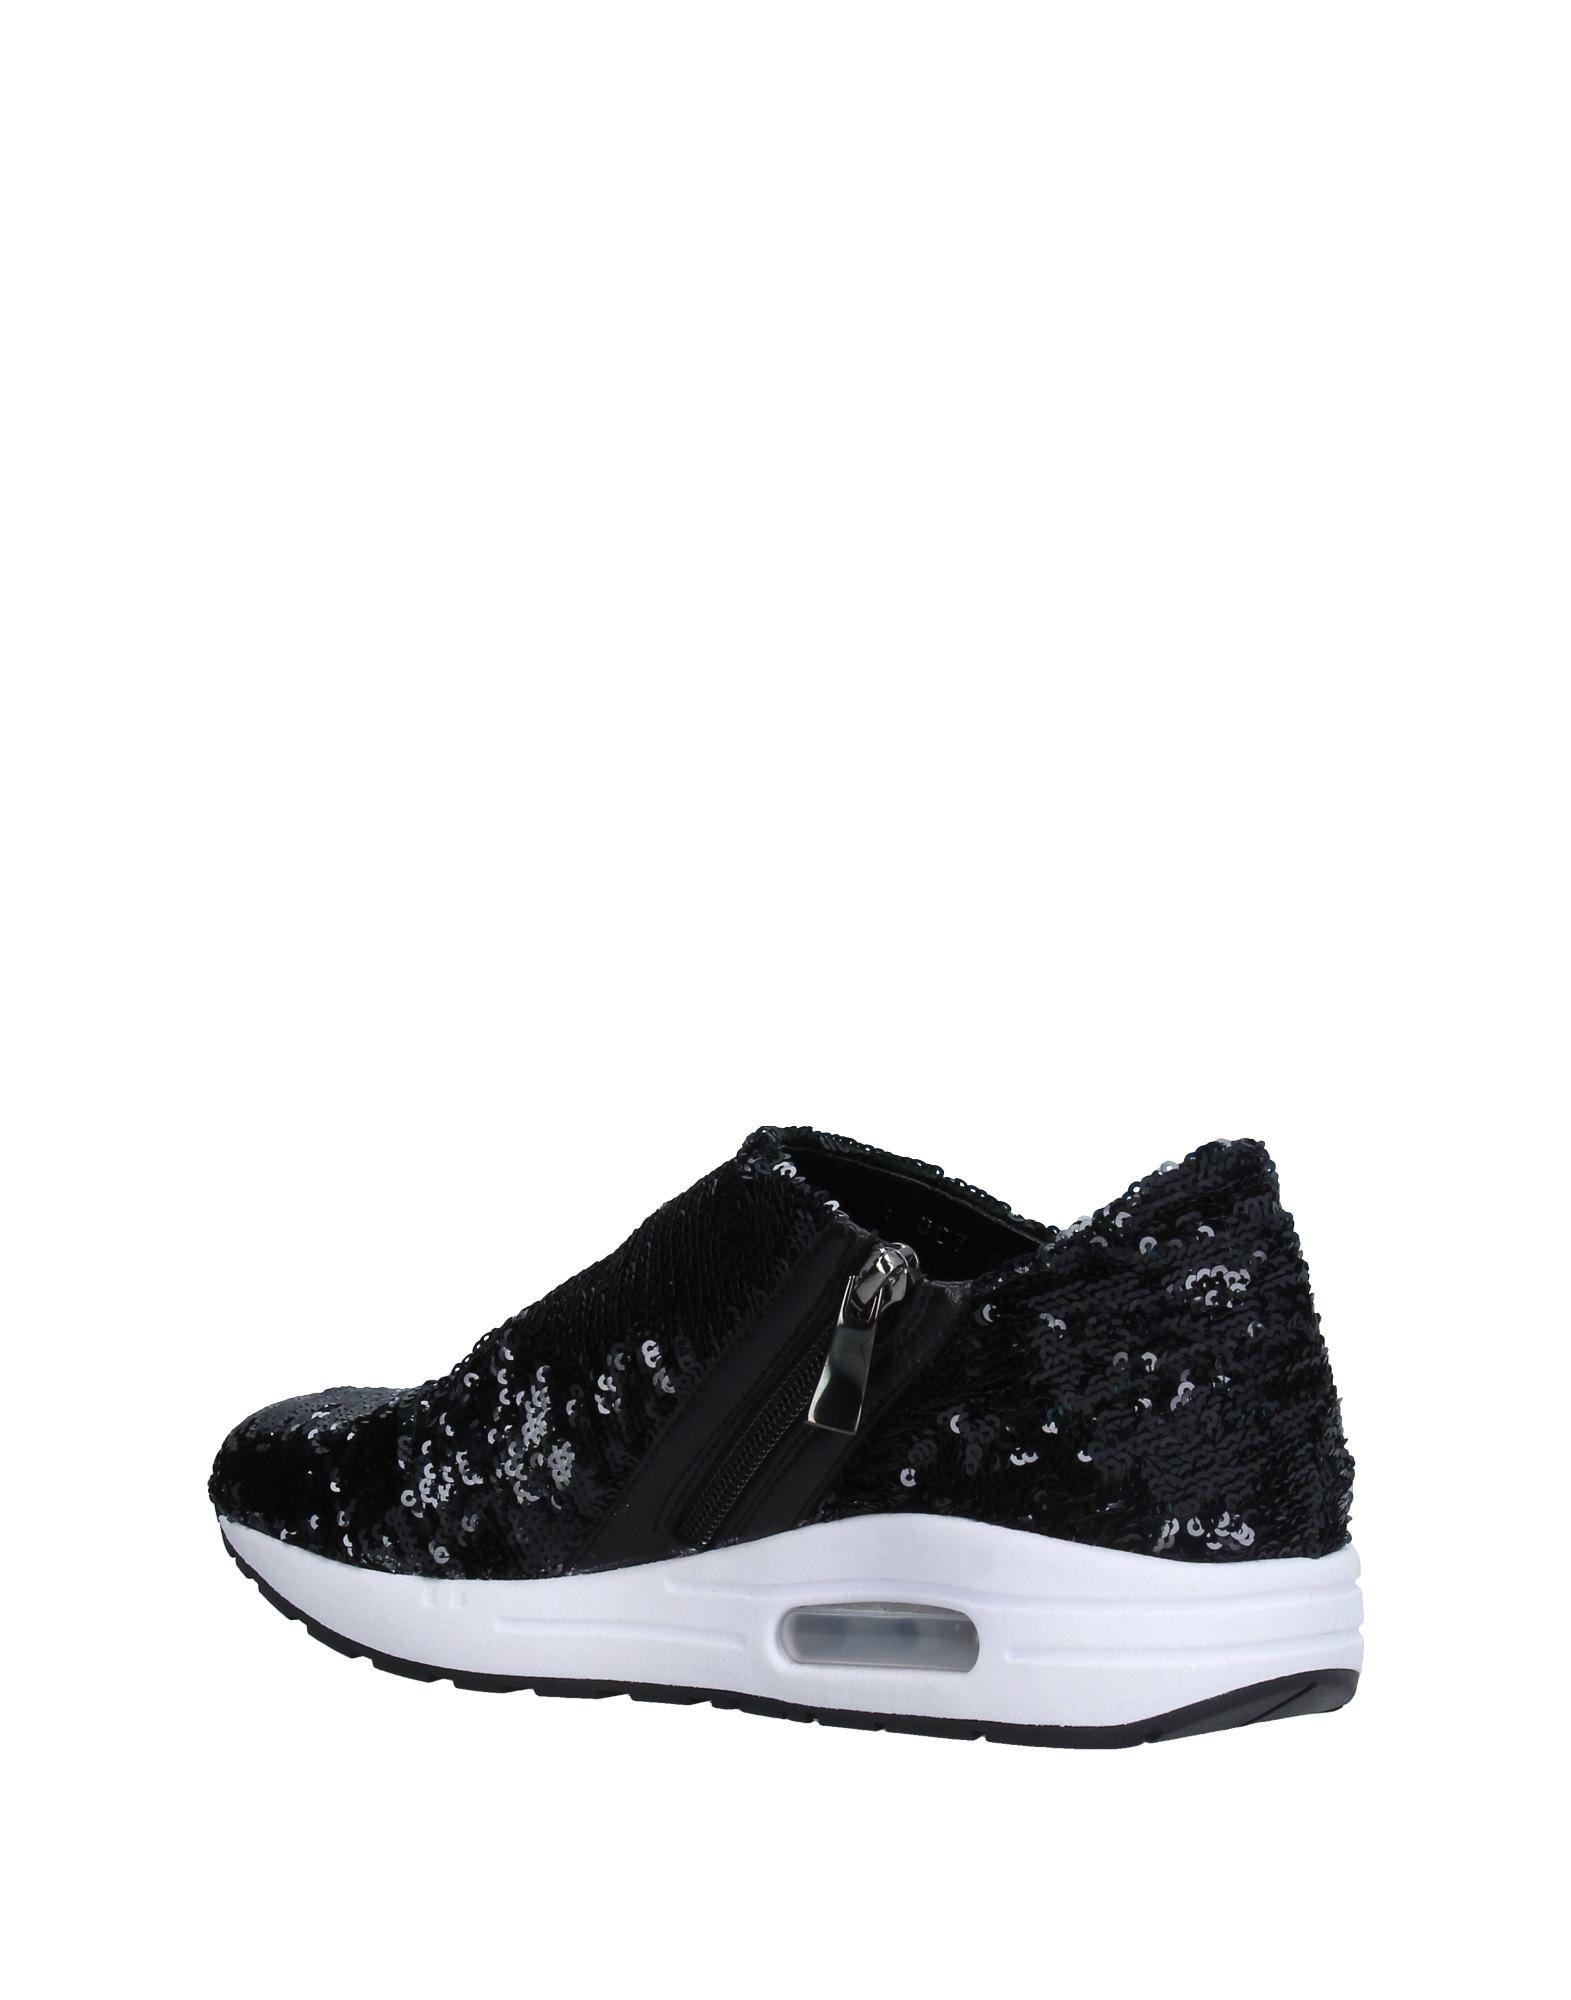 Sneakers Susana Traca Femme - Sneakers Susana Traca sur